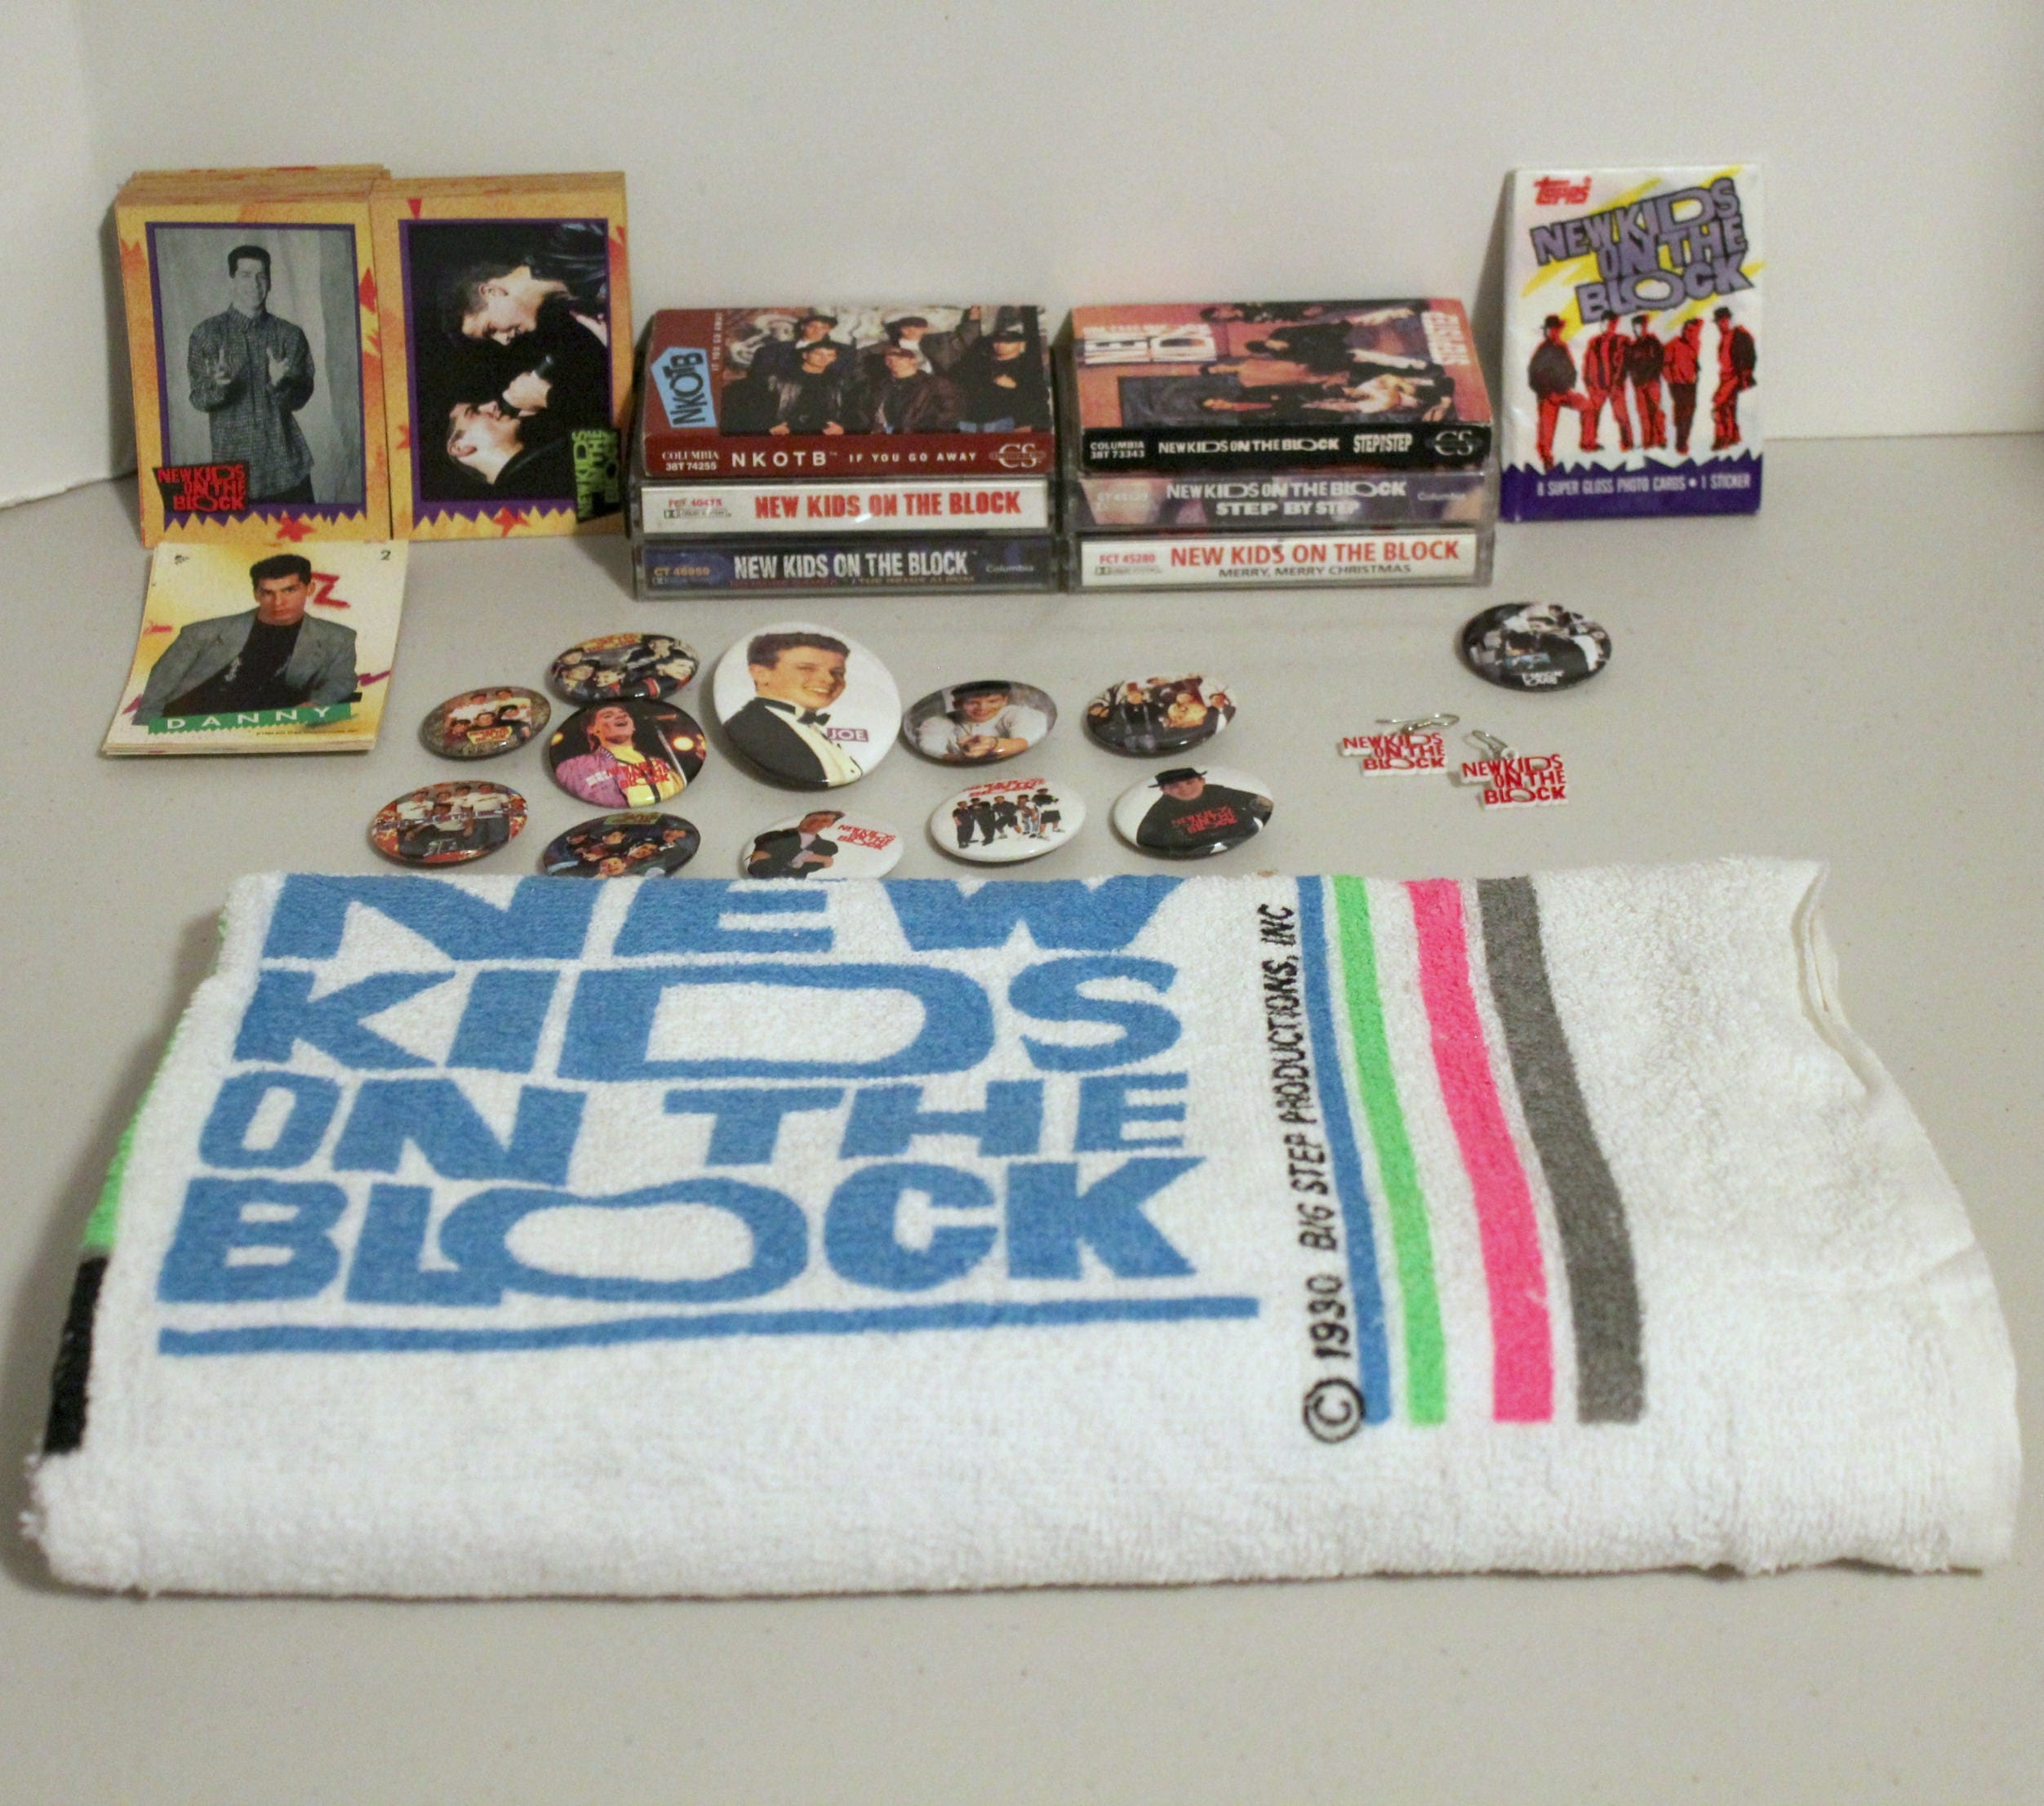 NKOTB Towel, Red Earrings, 6 Cassette Tapes, Topps Cards, Pins ...